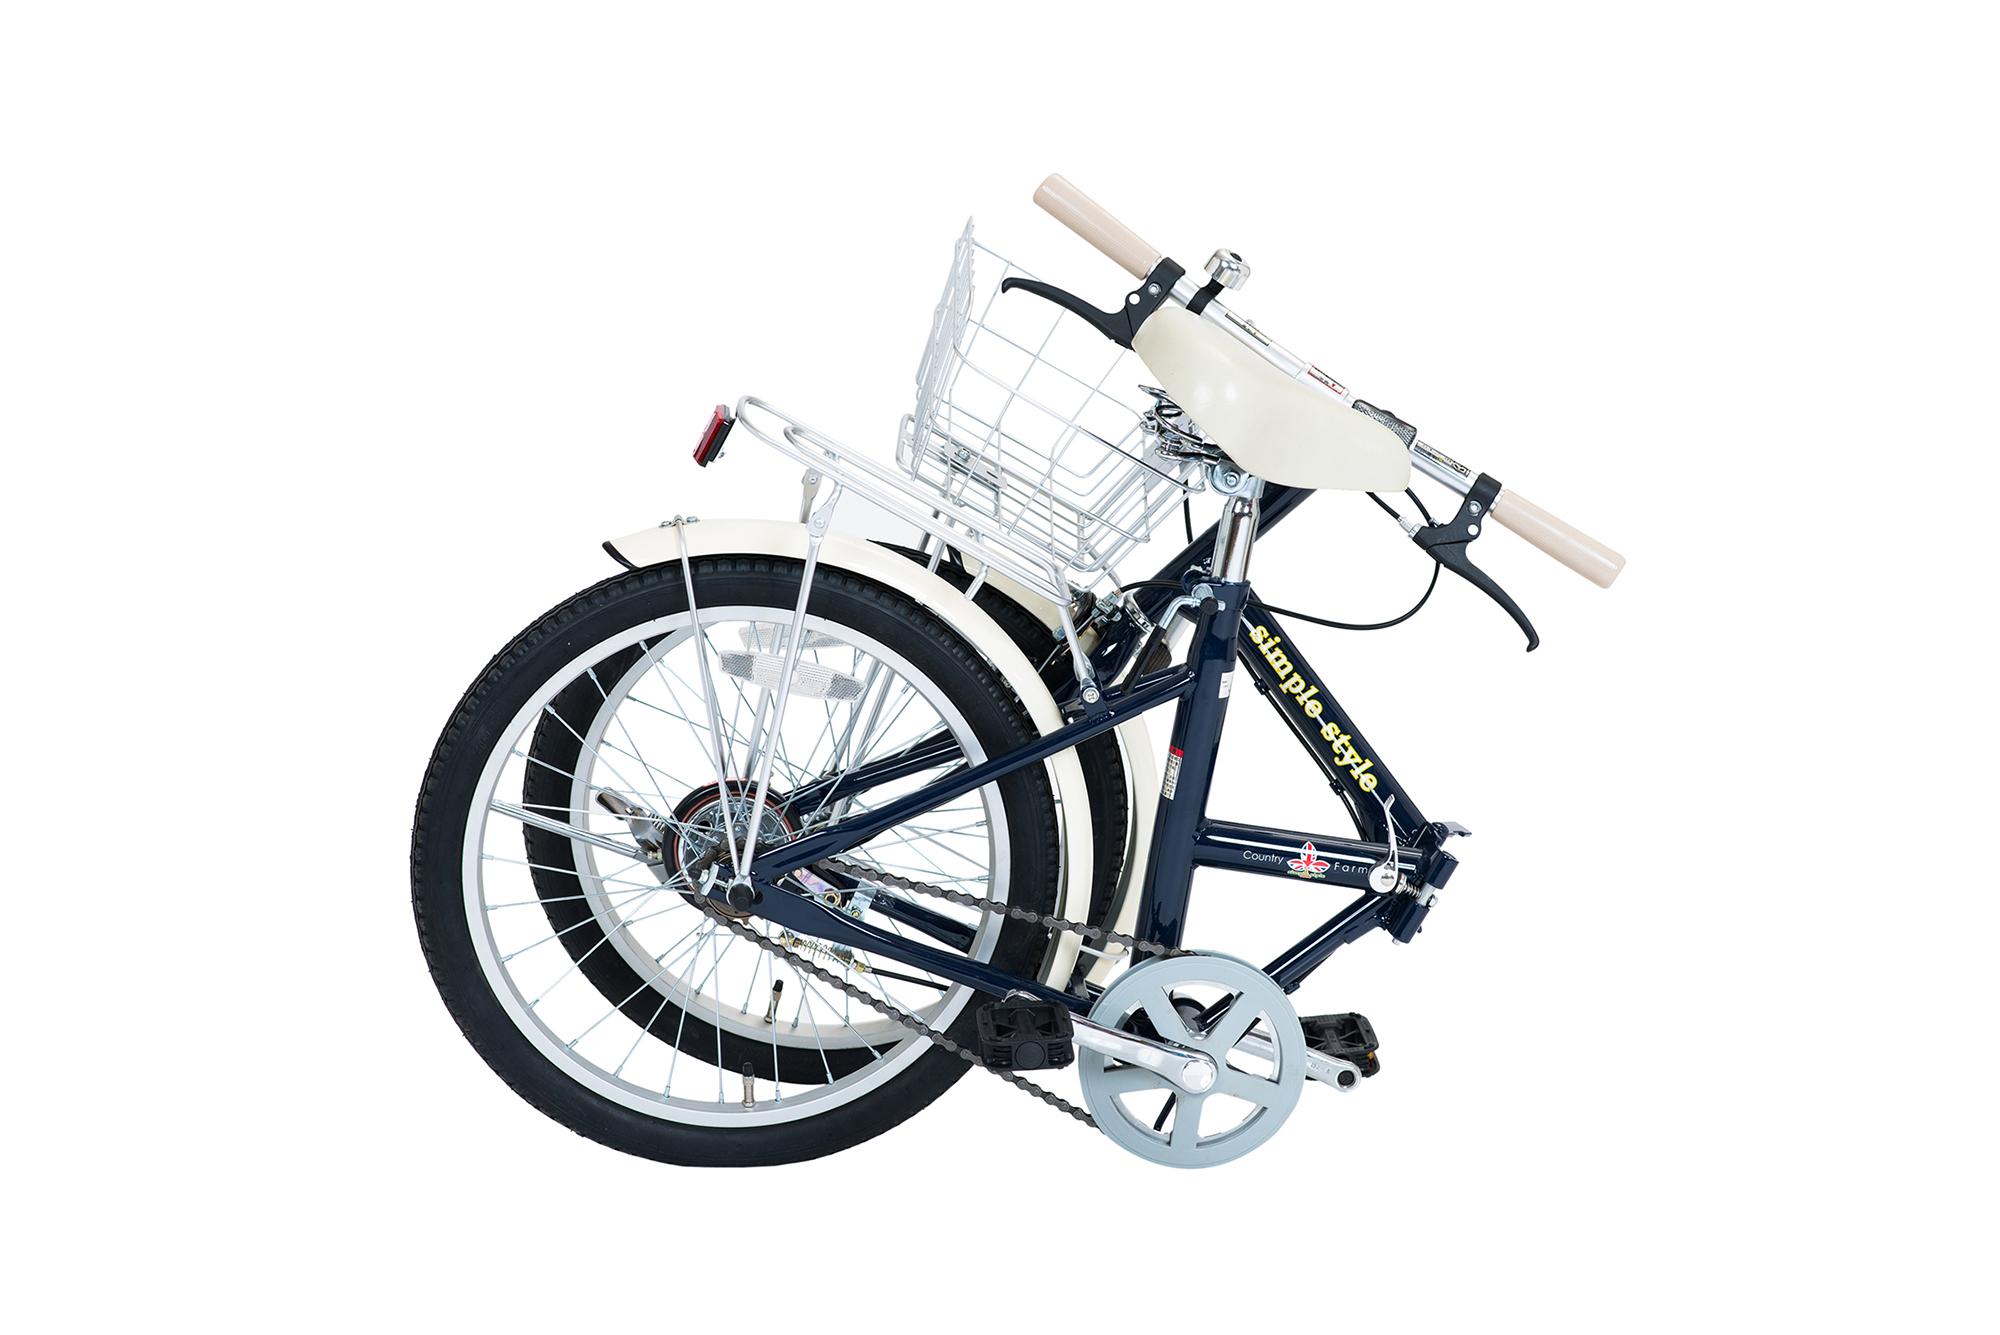 【KCD】シンプルスタイル 20型折たたみ自転車 LEDライト・カギ付 ネイビー